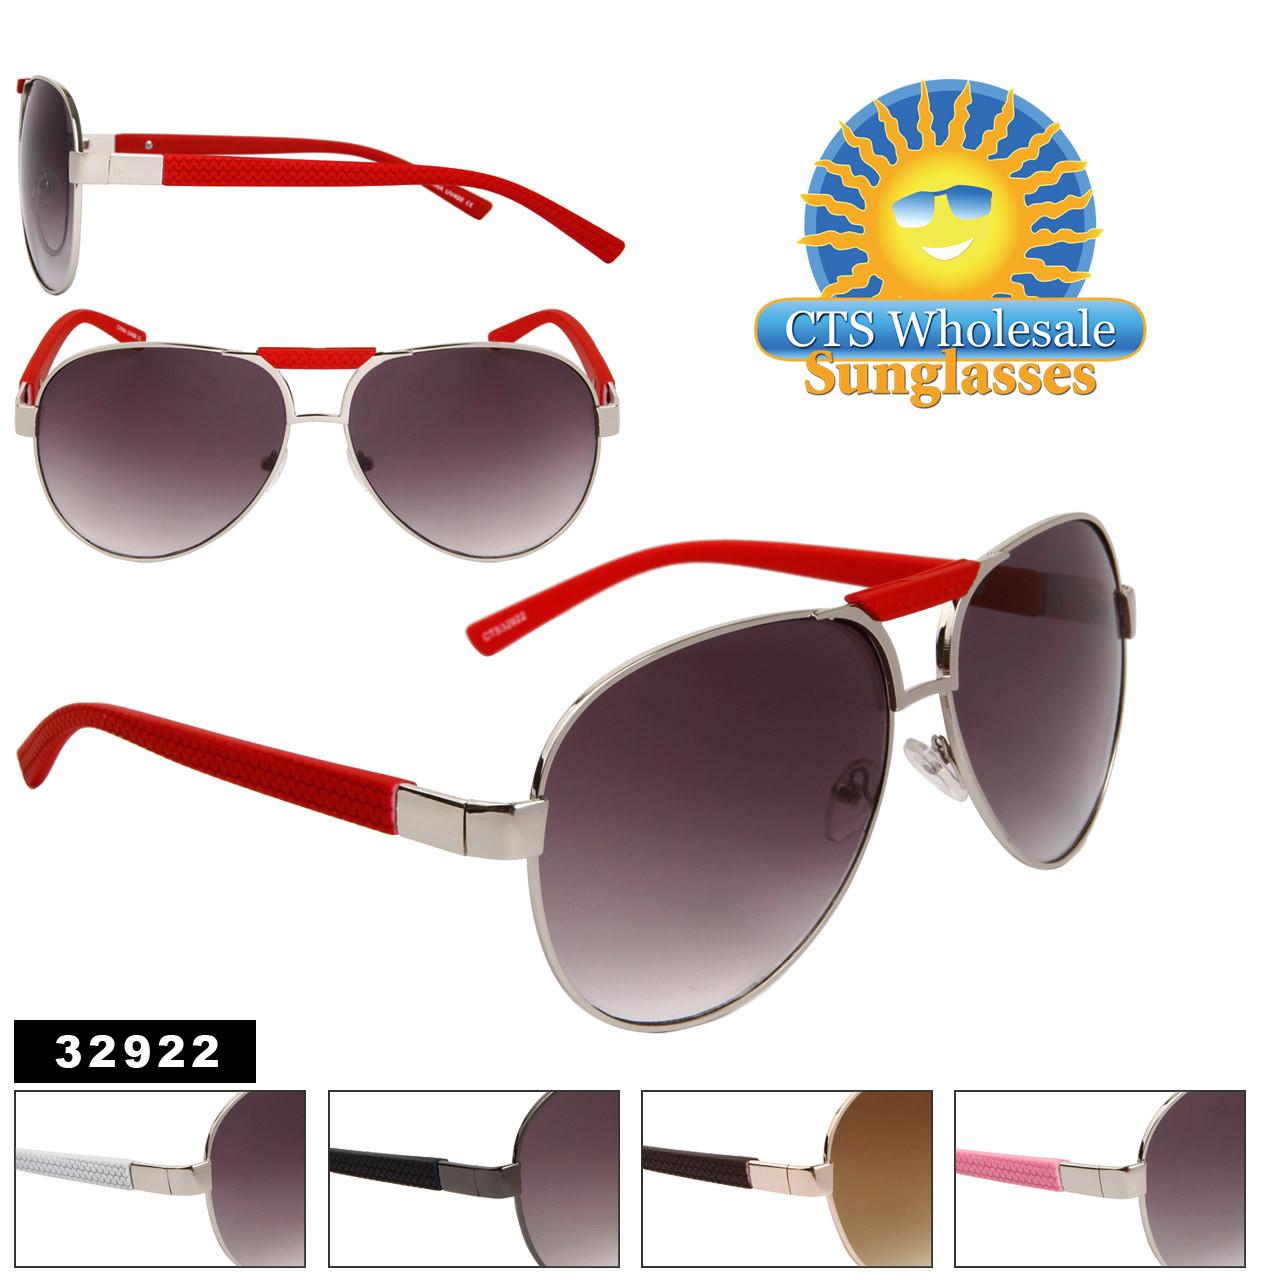 2a75aeb31f Aviator Bulk Sunglasses - Aviator- Style Cheap Wholesale Sunglasses ...